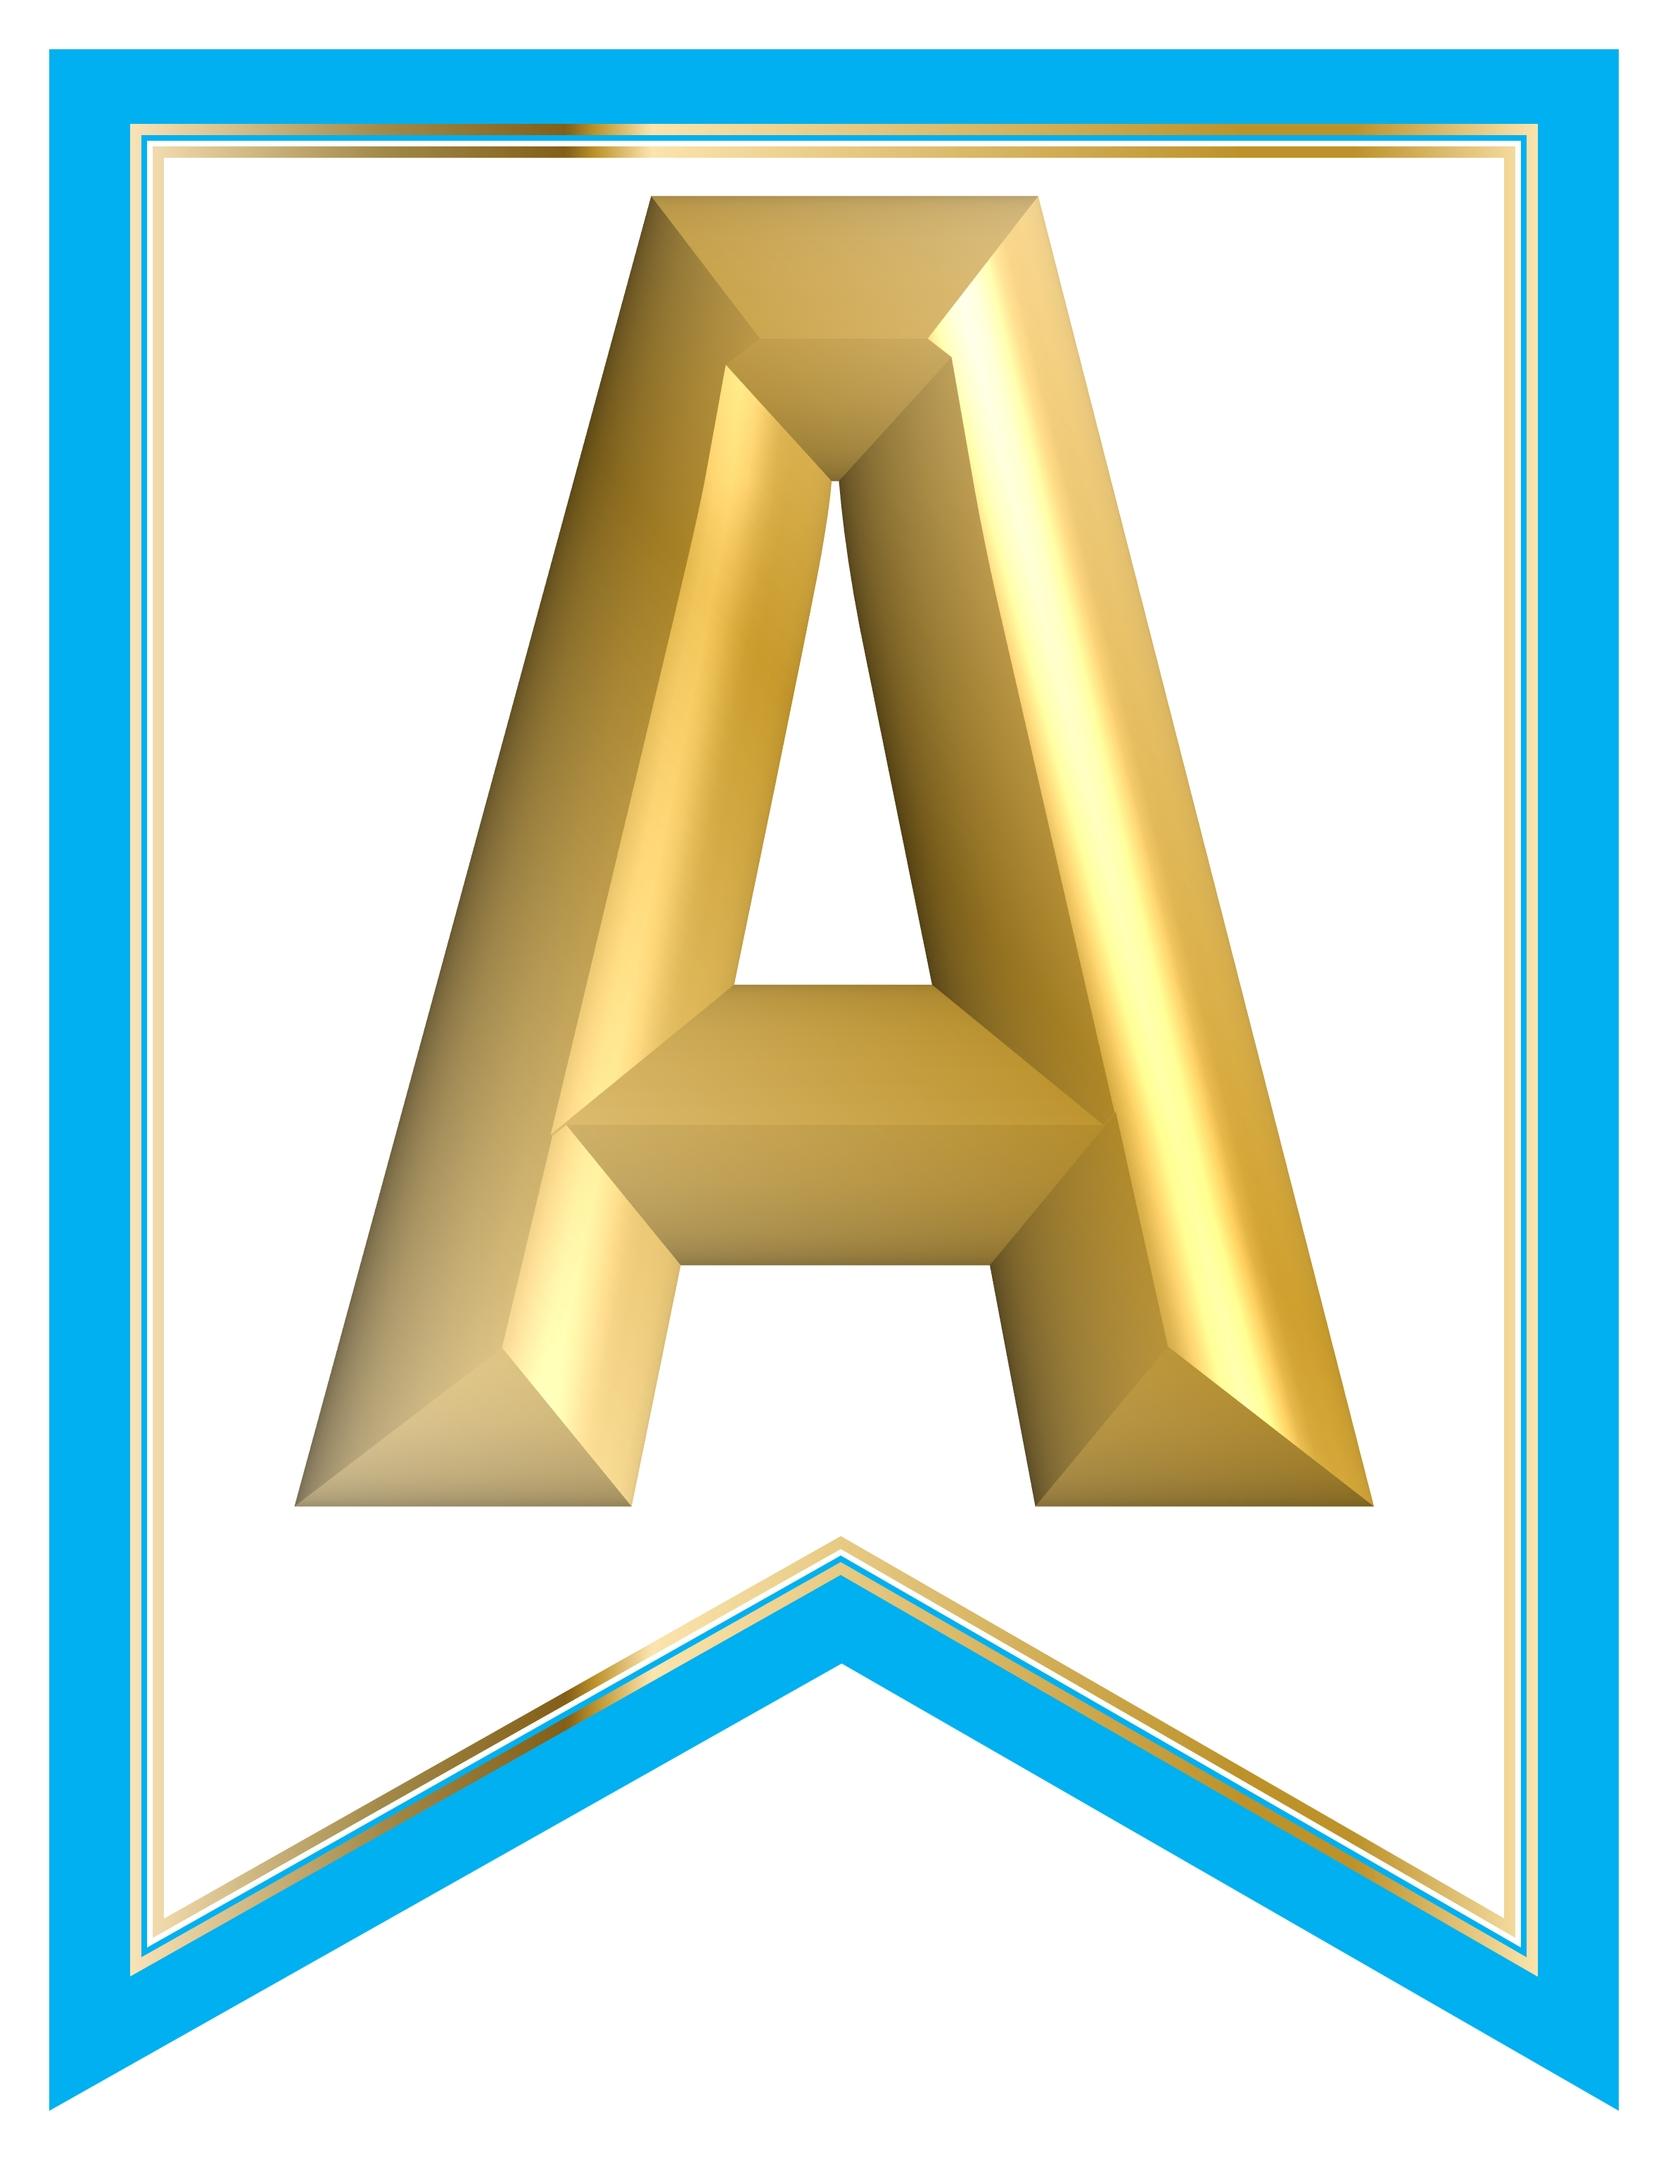 image regarding Printable Alphabet Banner known as SWALLOWTAIL-PRINTABLE-ALPHABET-BANNER-LETTERS-blue-white-GOLD